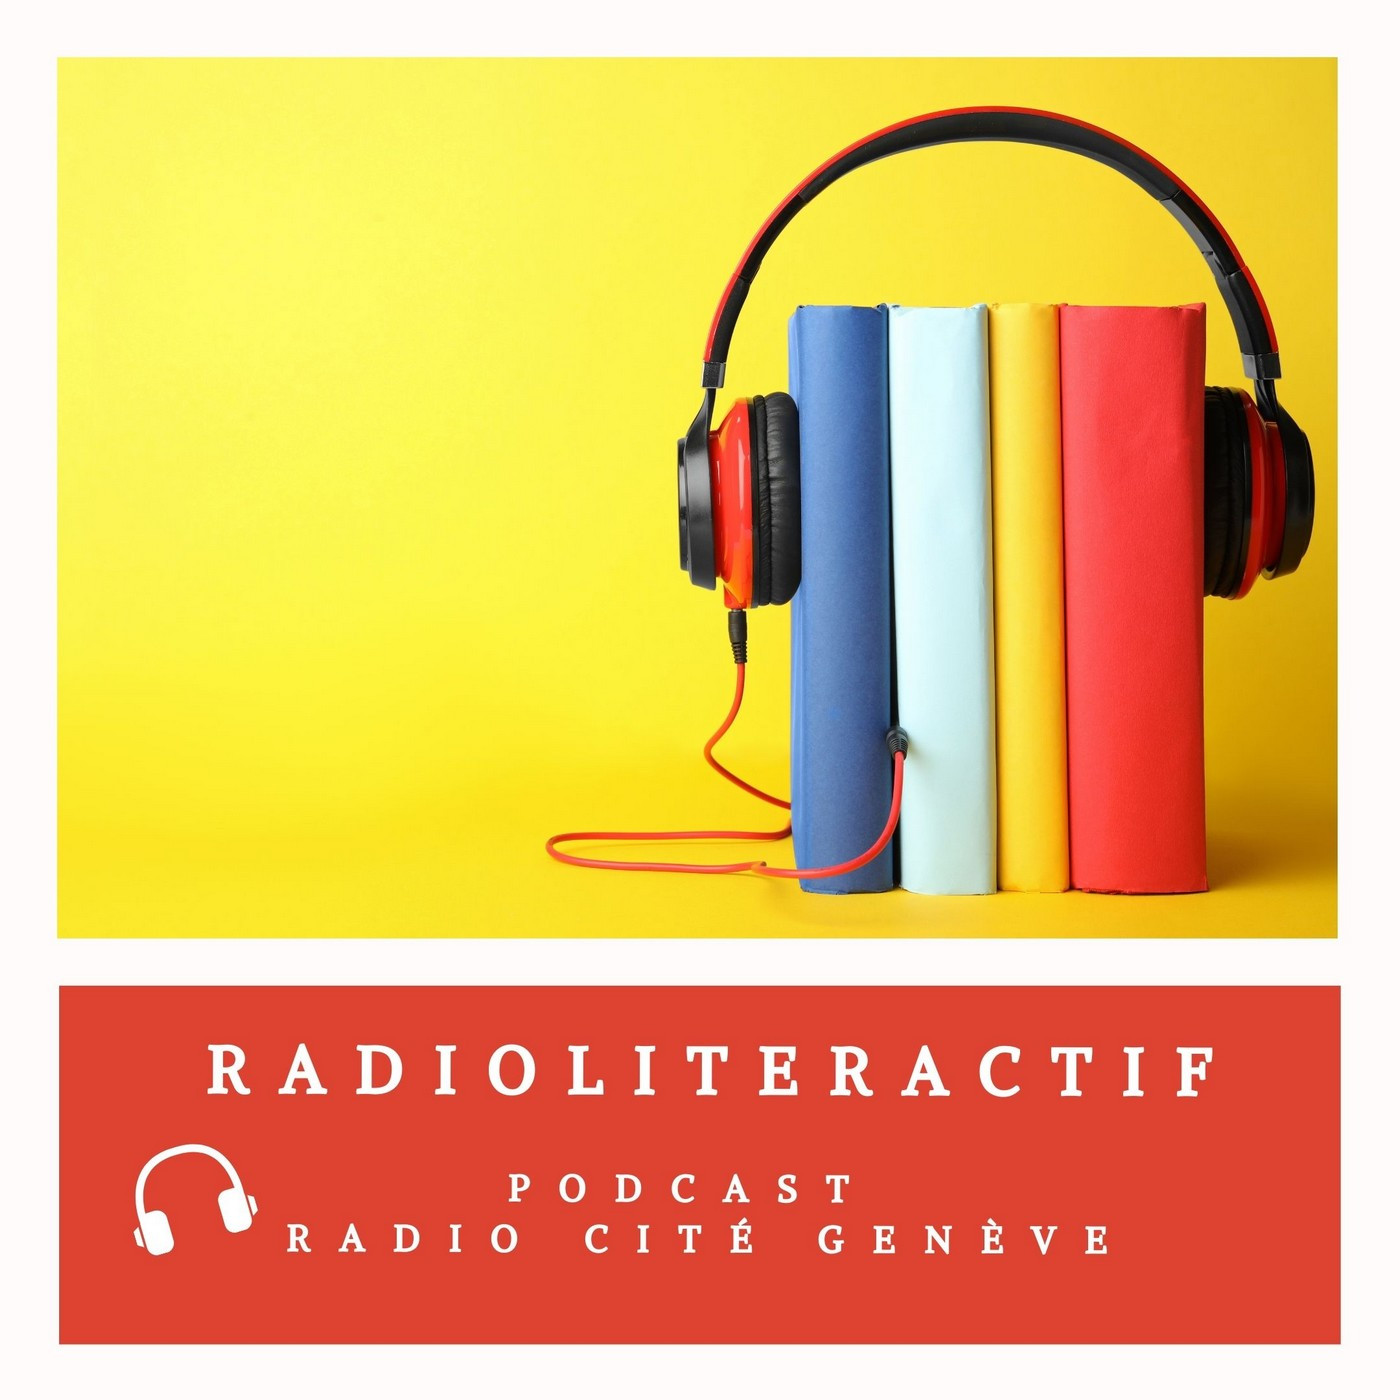 Radioliteractif du 16/11/20 - Jean-Pierre Keller etPierre Varcher